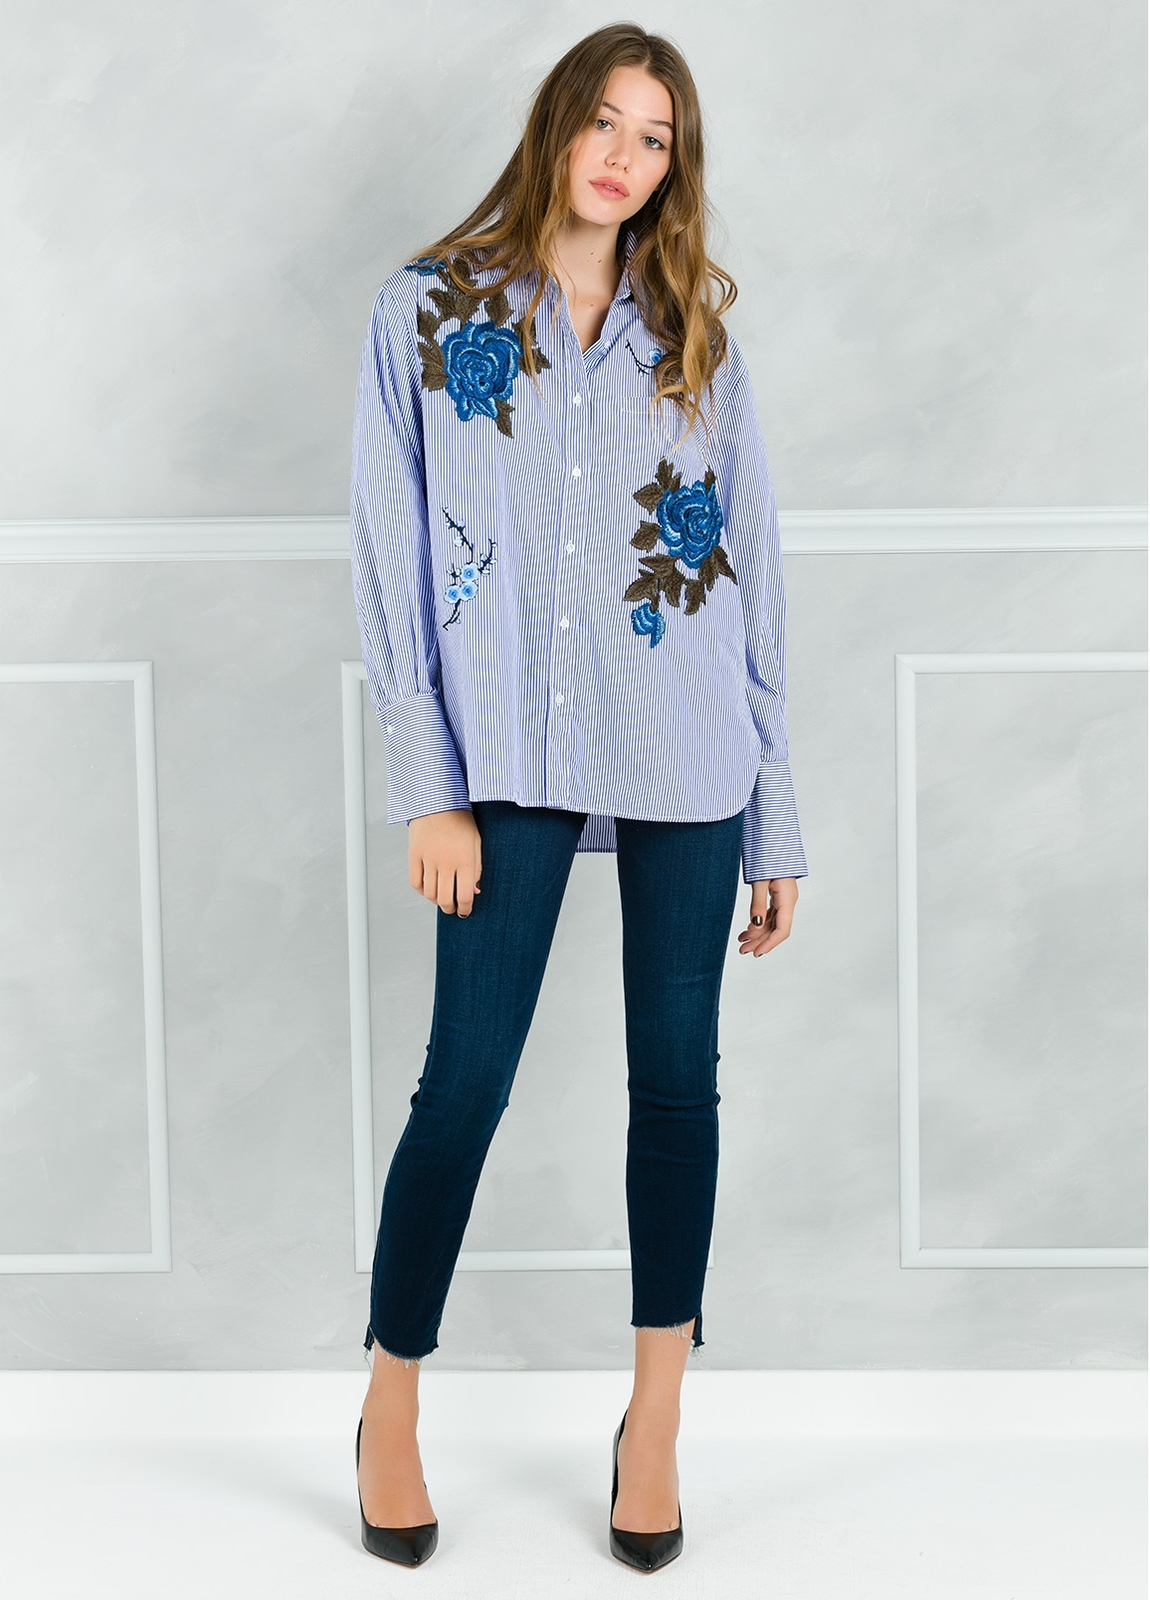 Camisa woman modelo CRIDL estampado maxiflor color azul. - Ítem2